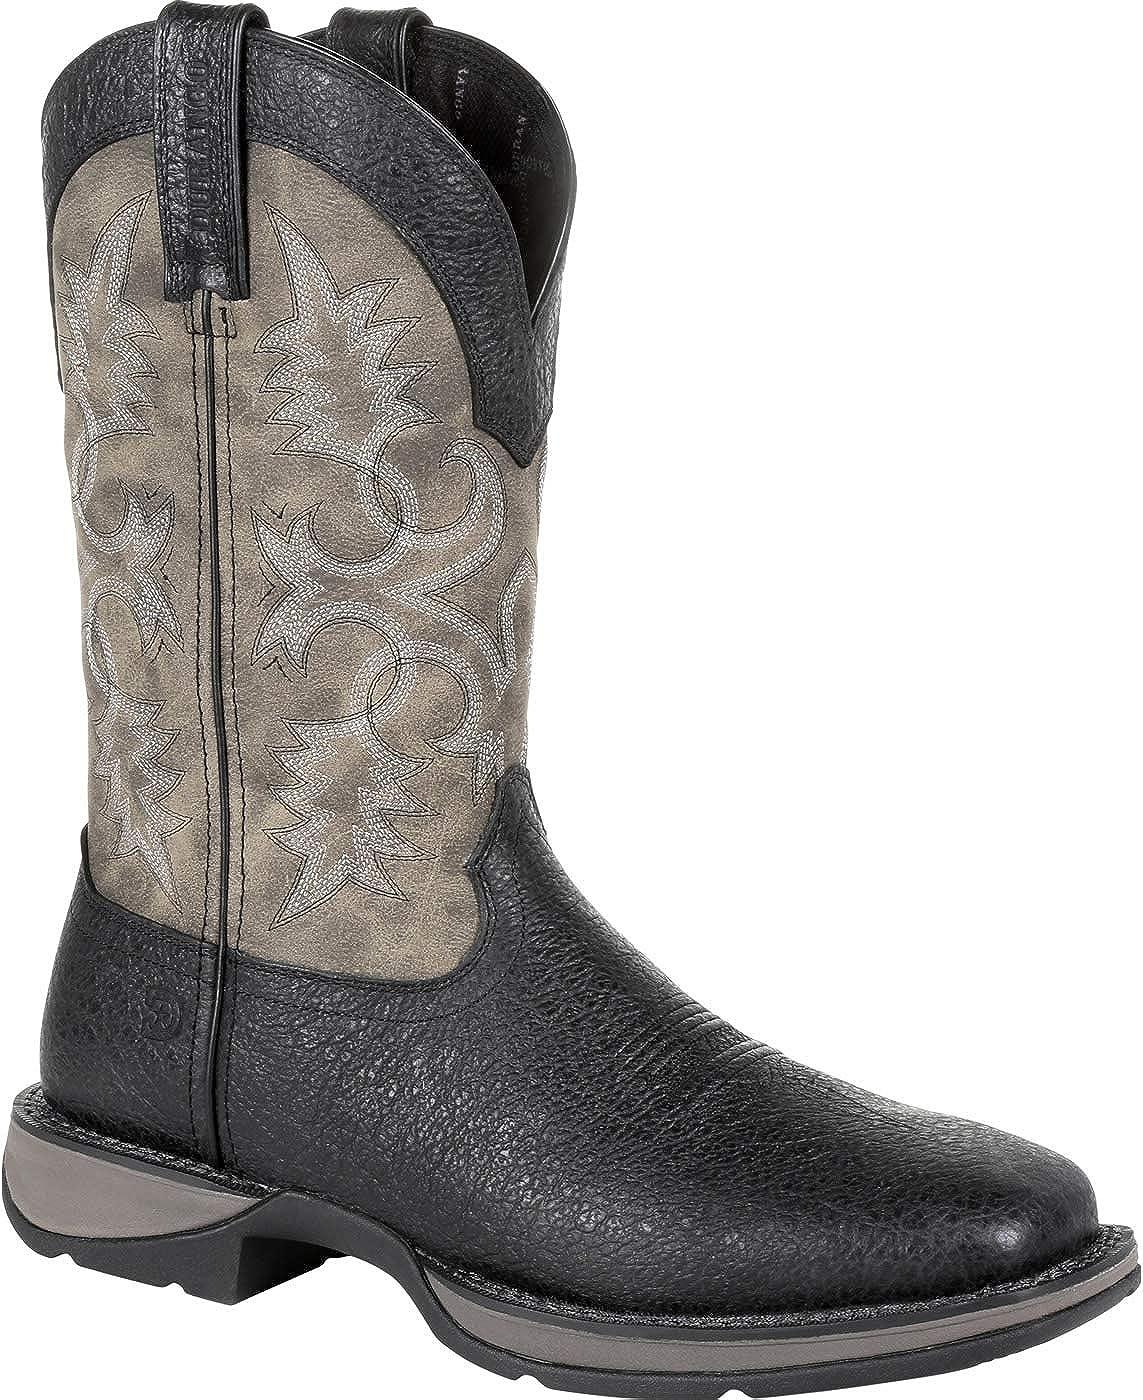 Durango Black Western Time sale Boot Ranking TOP8